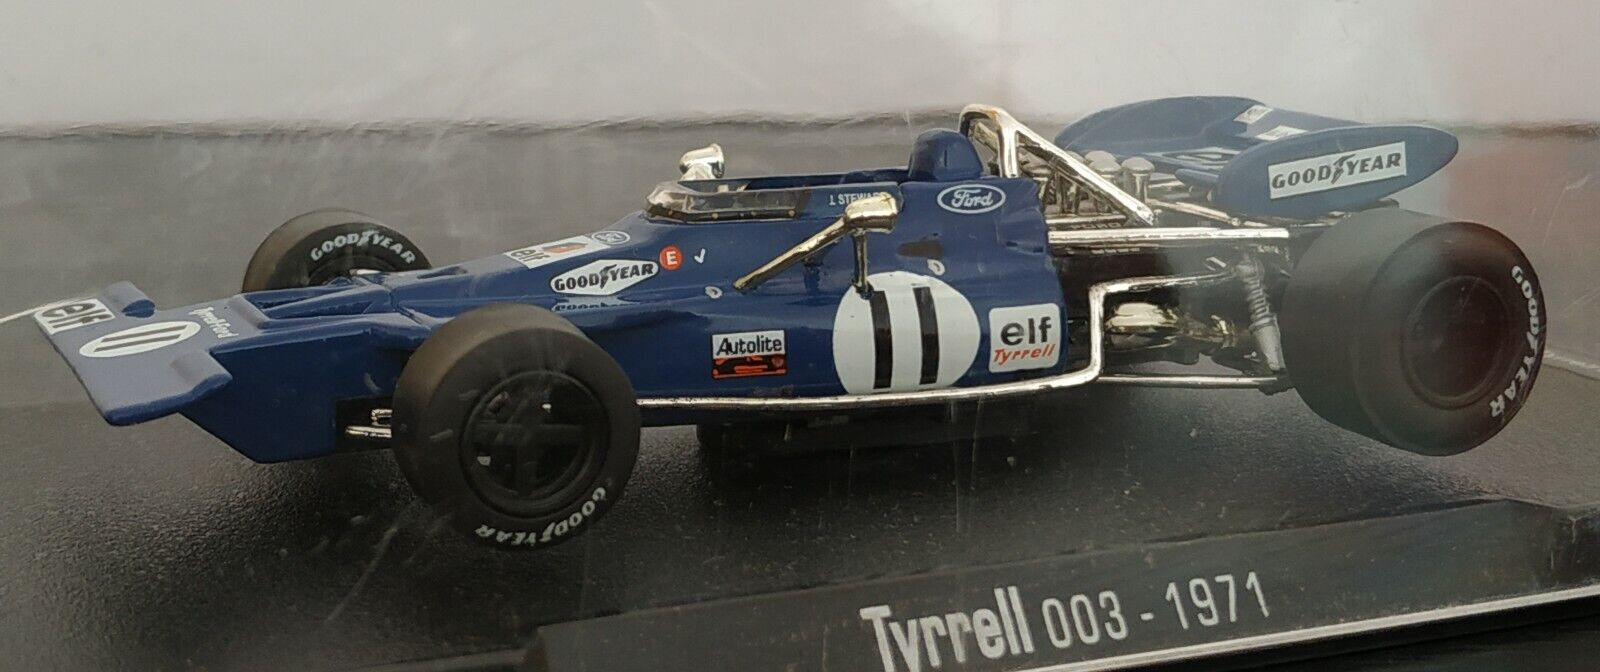 143 TYRRELL 003 1971 F1 FORMULA 1 COCHE DE COLECCION A ESCALA